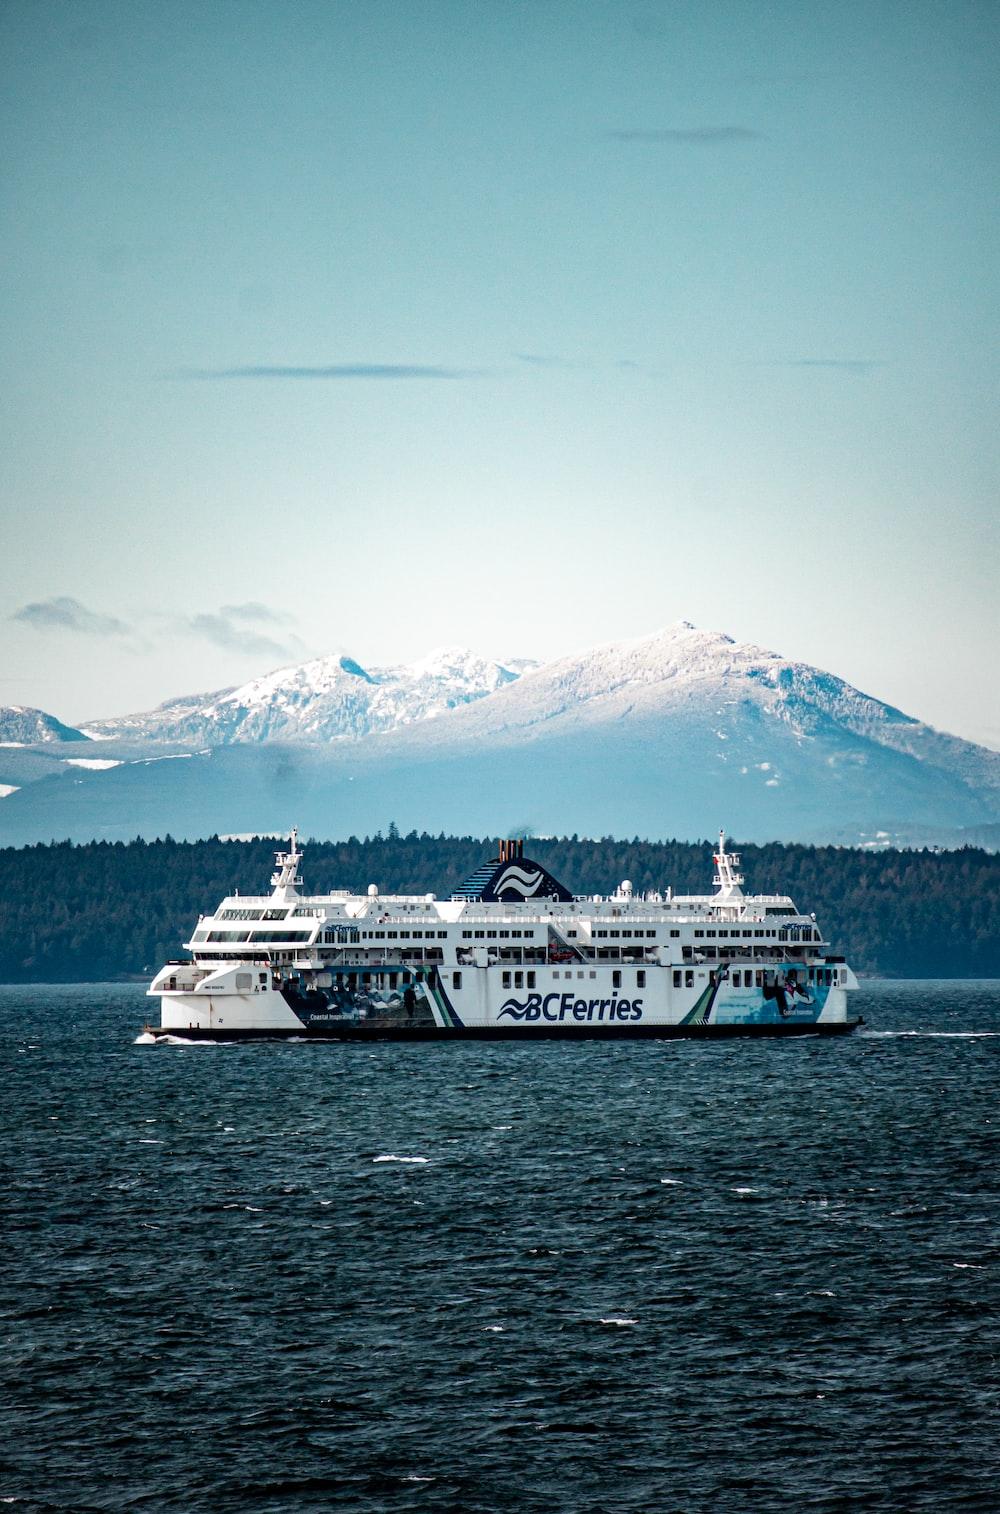 white ship on sea near snow covered mountain during daytime